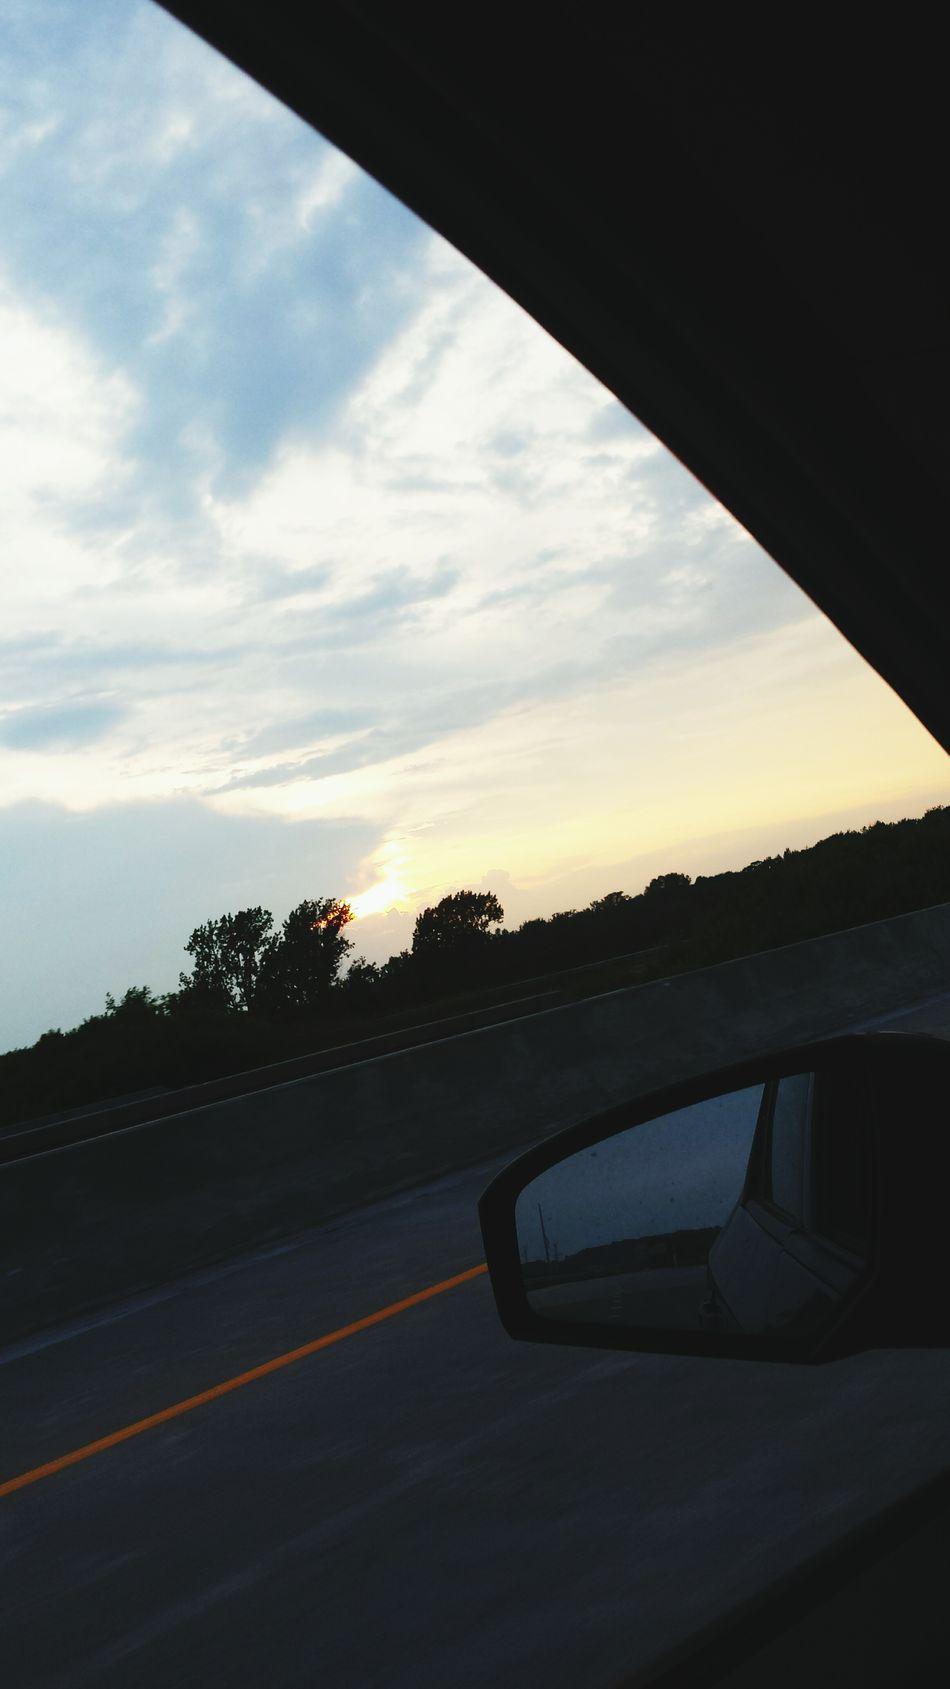 sunset drive-bys Capturingsunsets WhileDriving